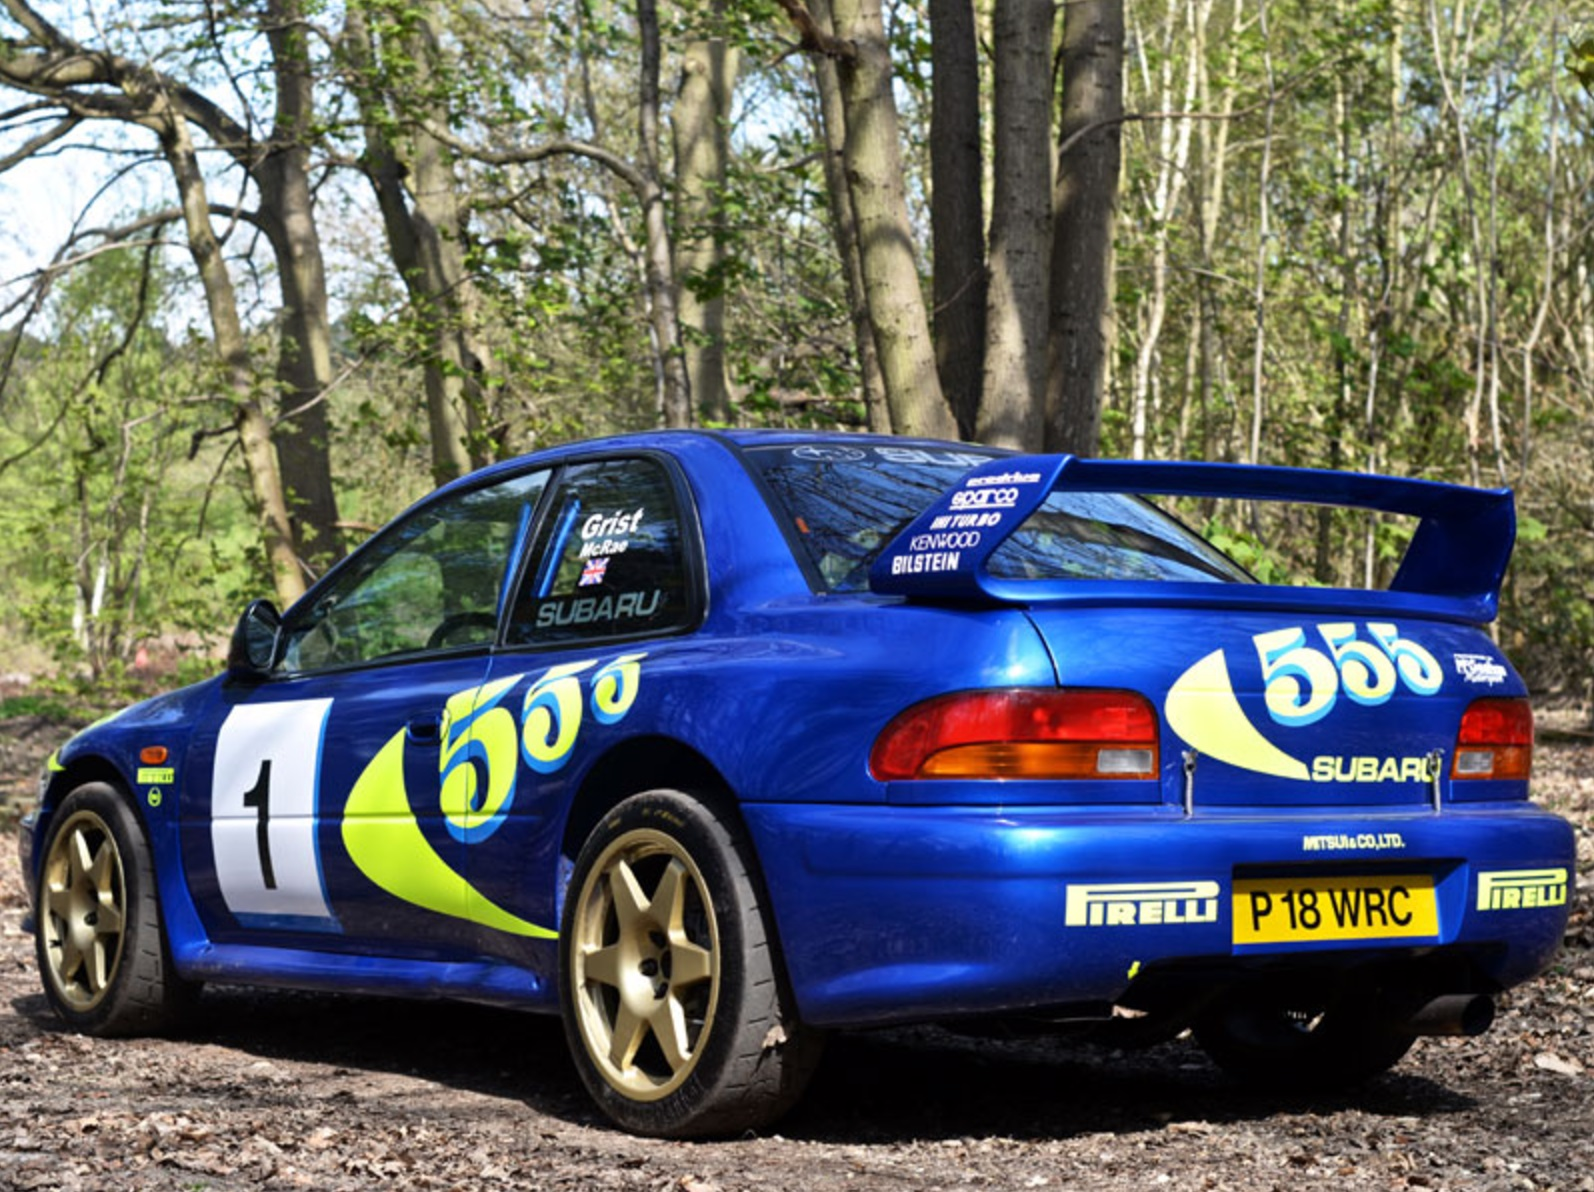 Subaru Impreza WRC Test Car Colin McRae (3)